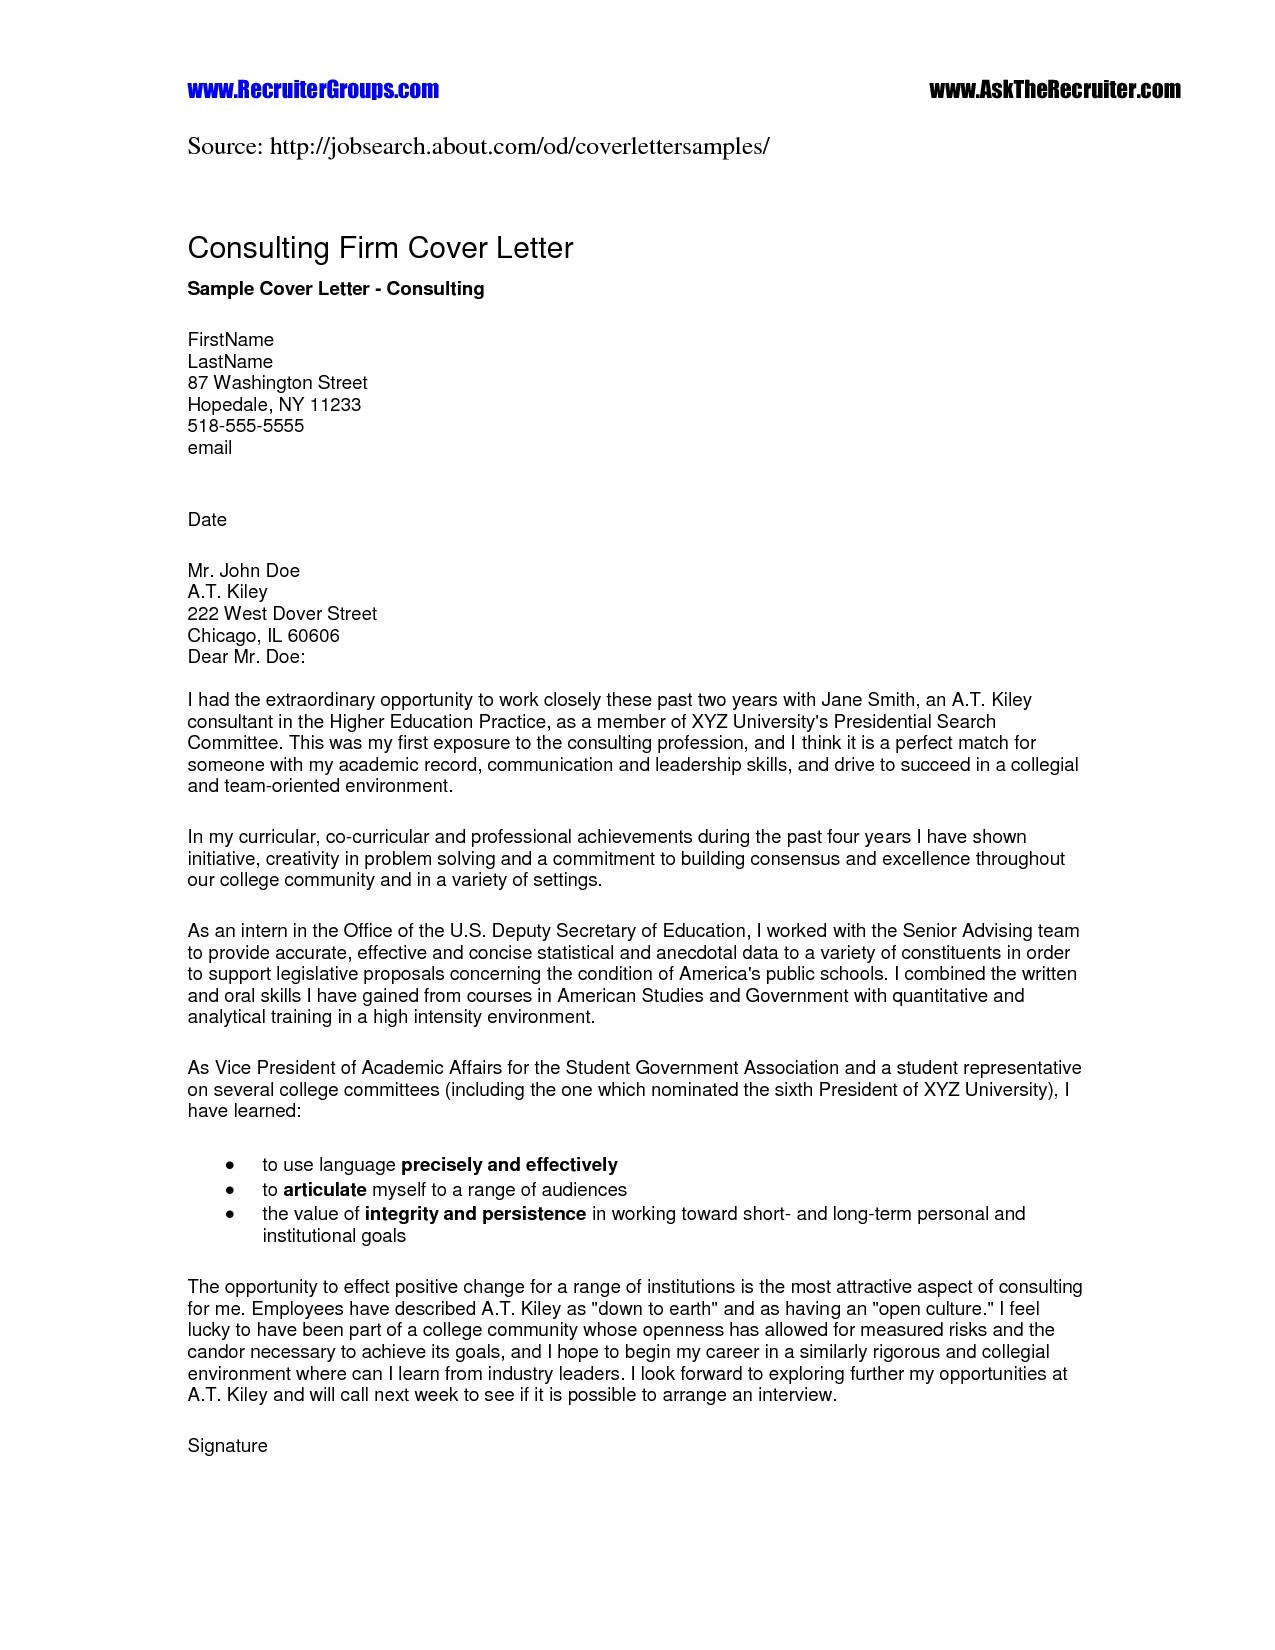 Loan Repayment Letter Template - Simple Loan Contract Template Luxury Letter Template for Loan